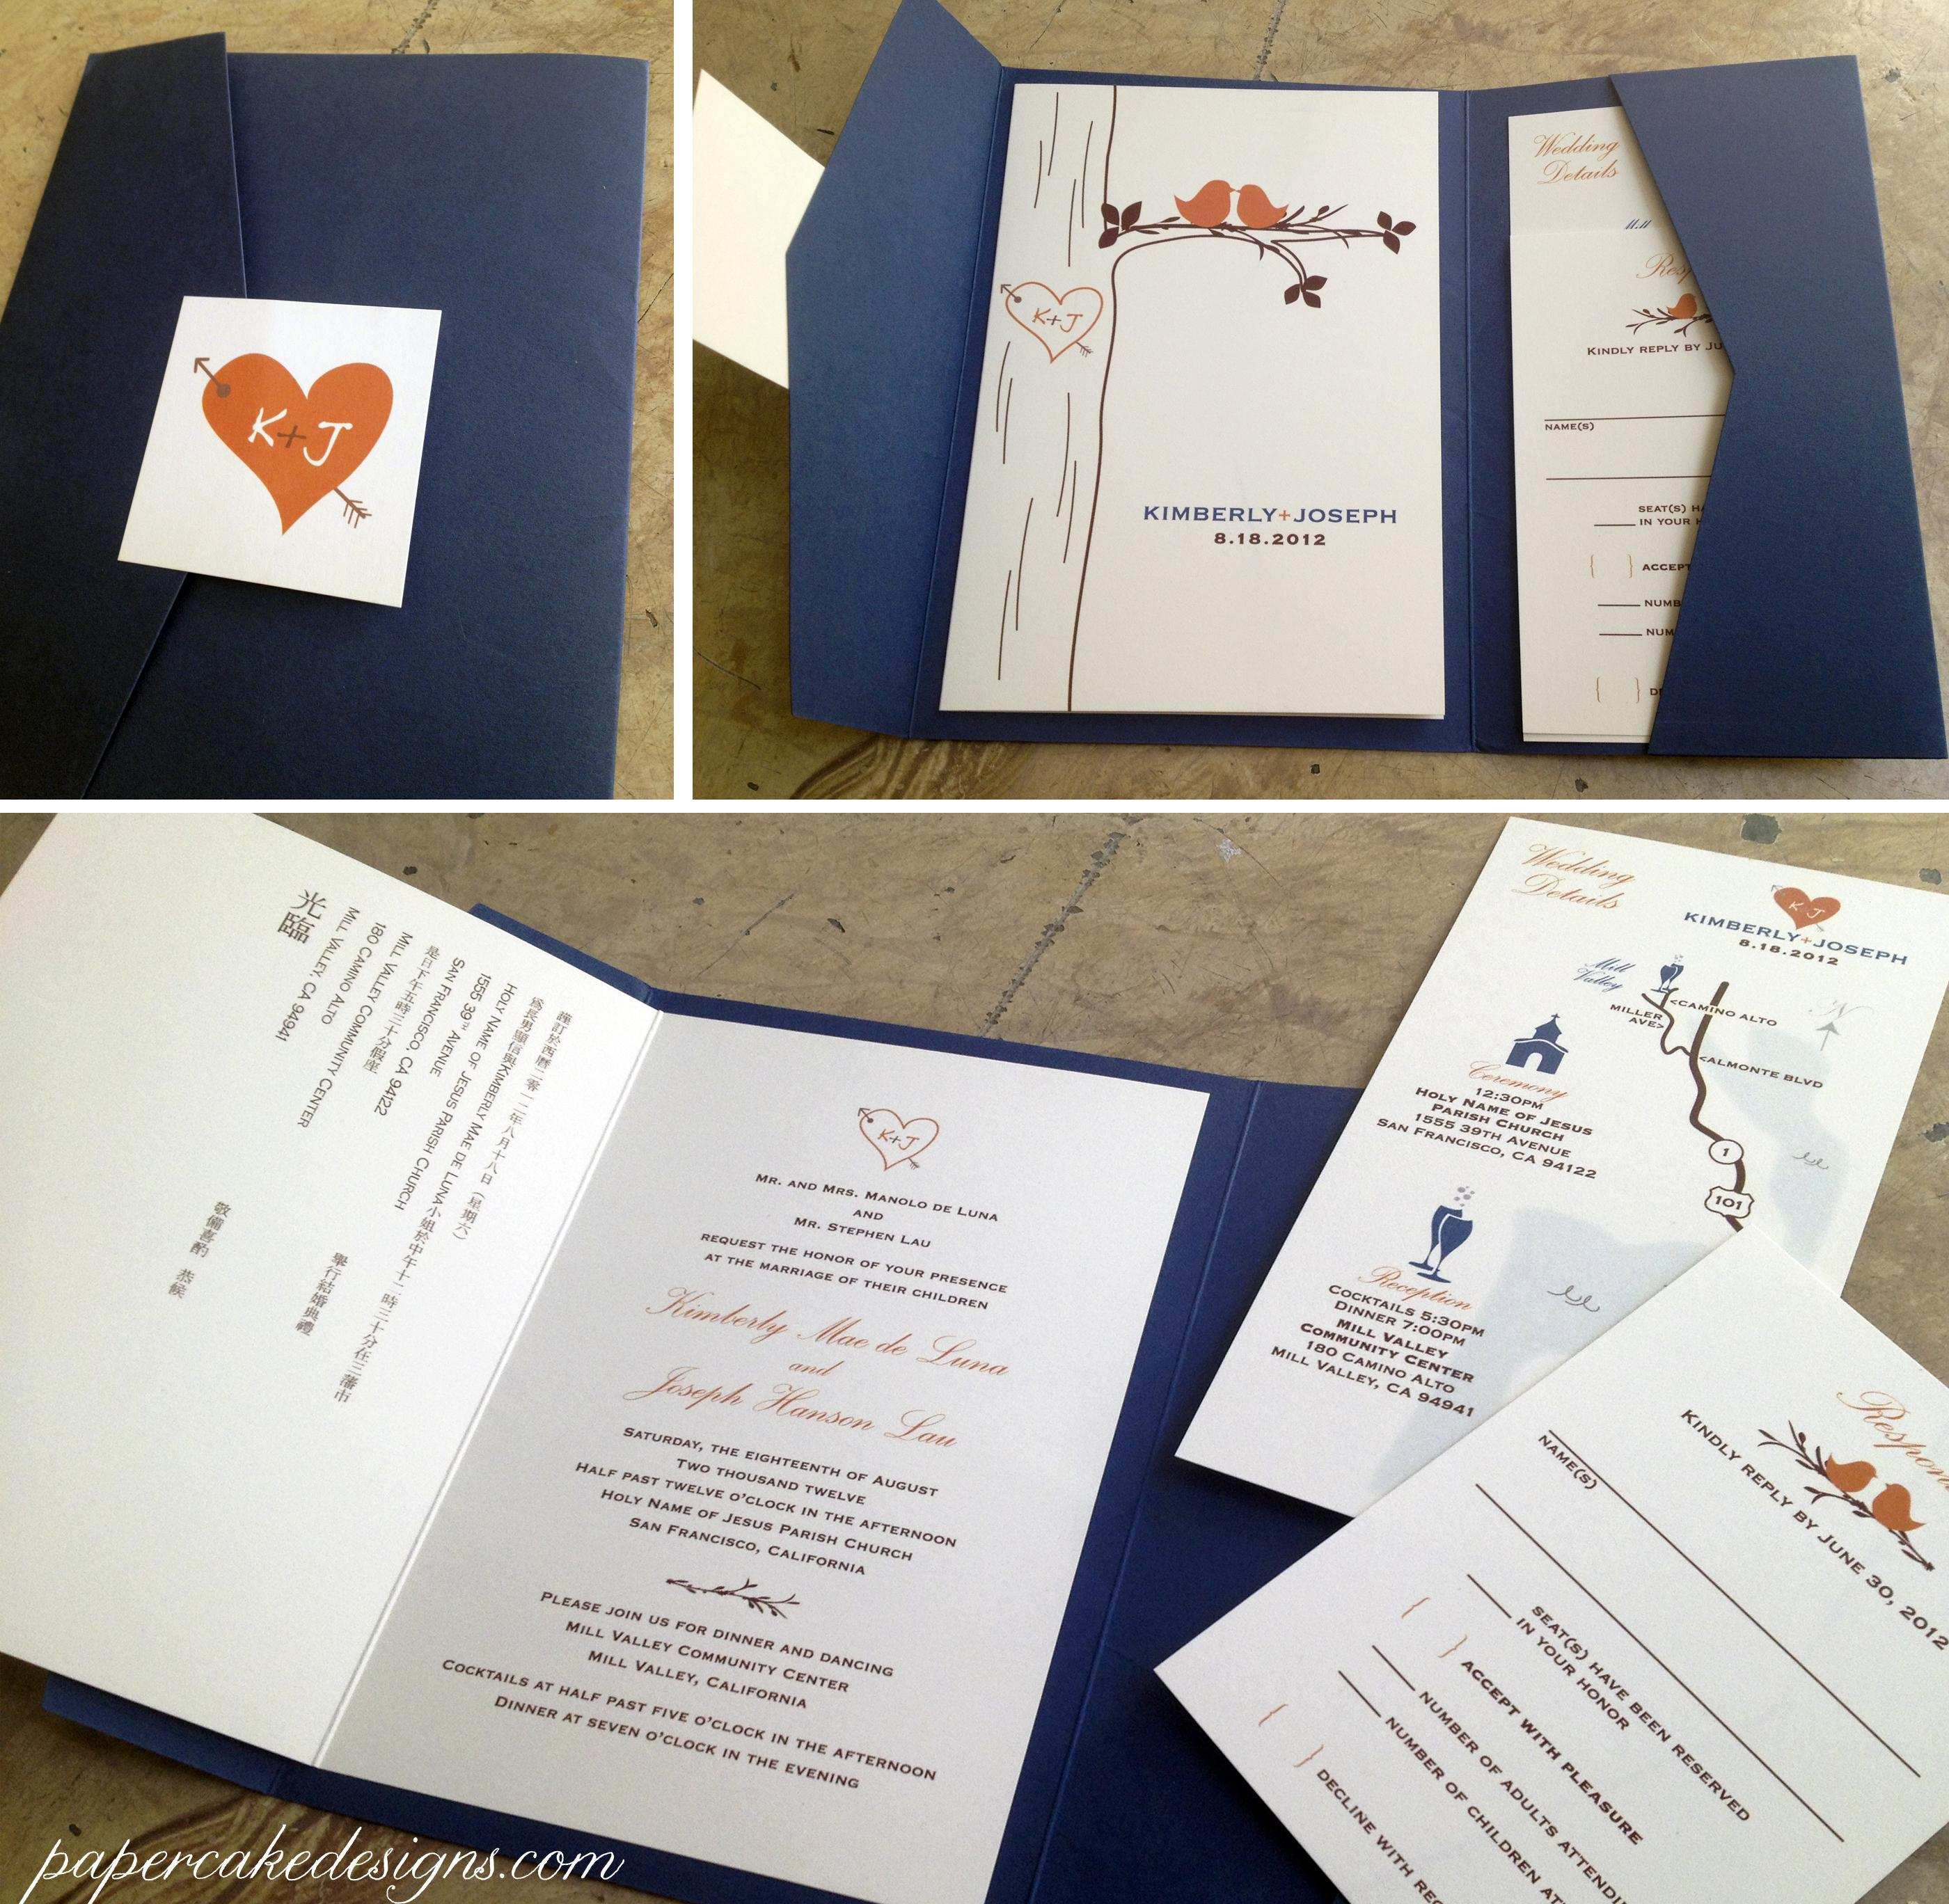 41 Adding Design Your Own Wedding Invitation Template With Stunning Design for Design Your Own Wedding Invitation Template